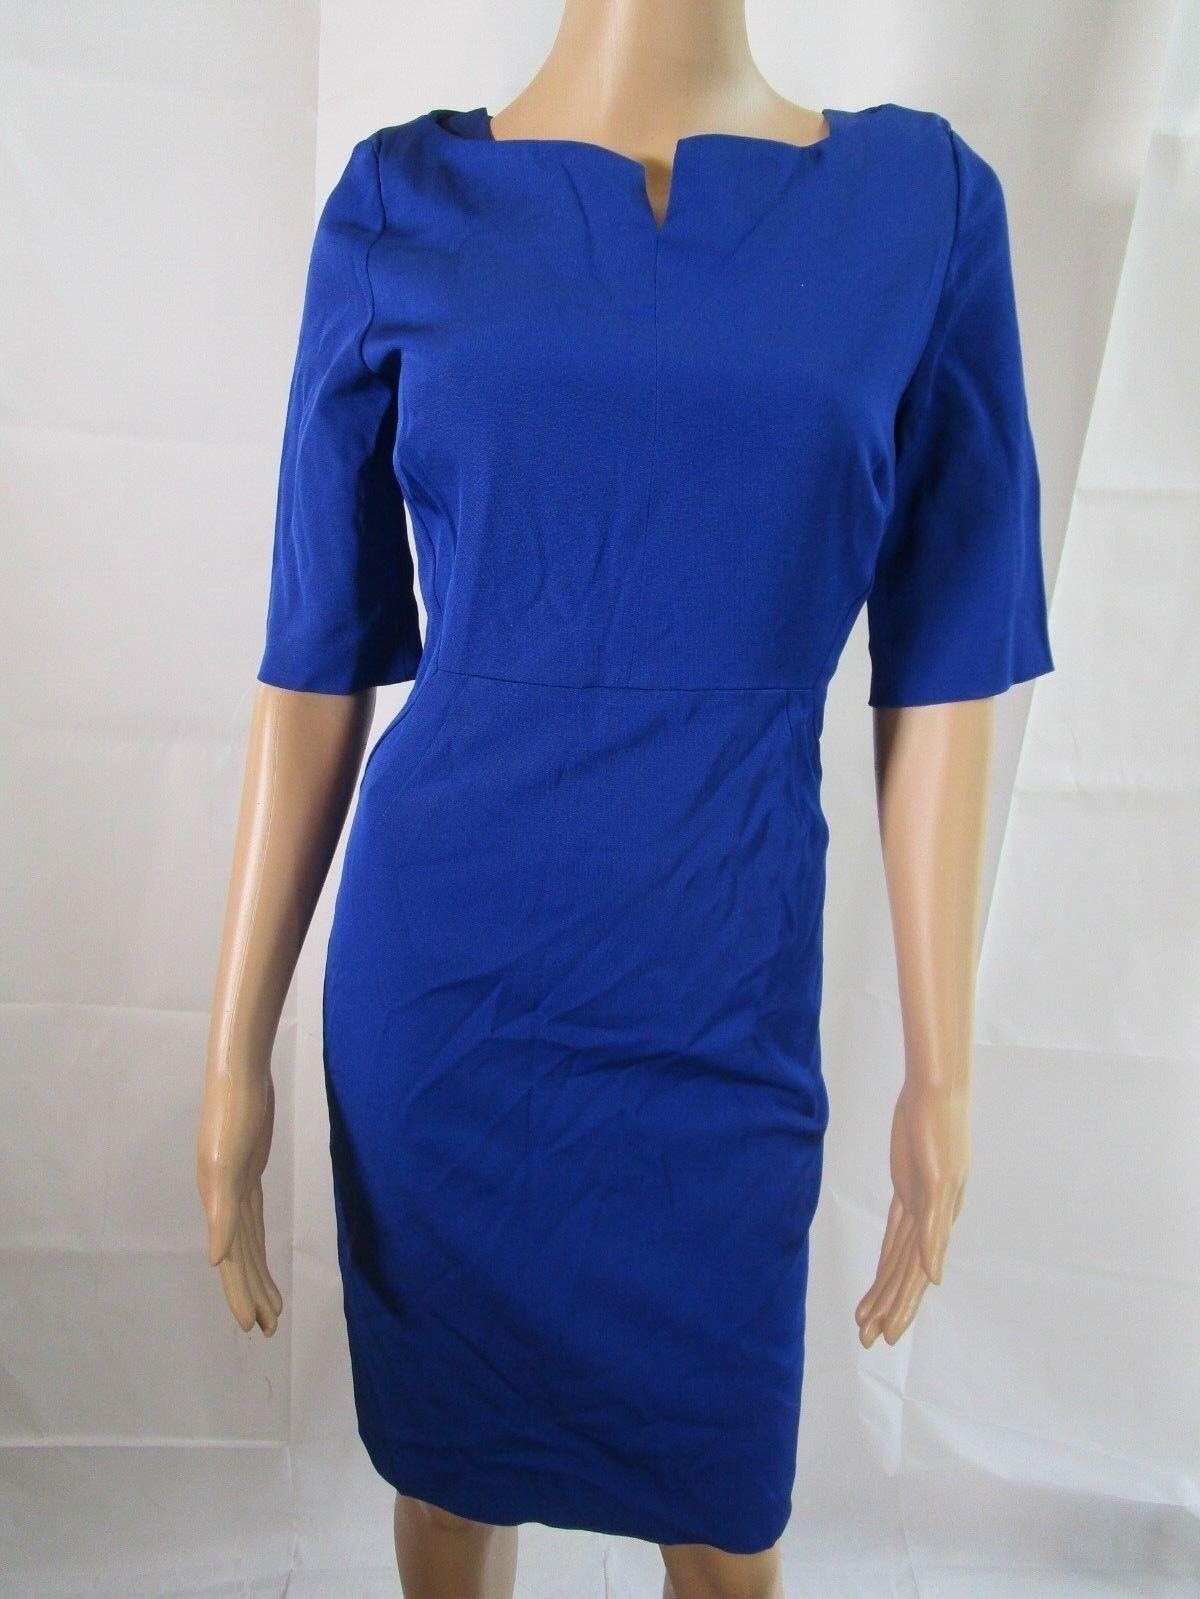 L.K. Bennett Blau DR Tan Dress Größe 8